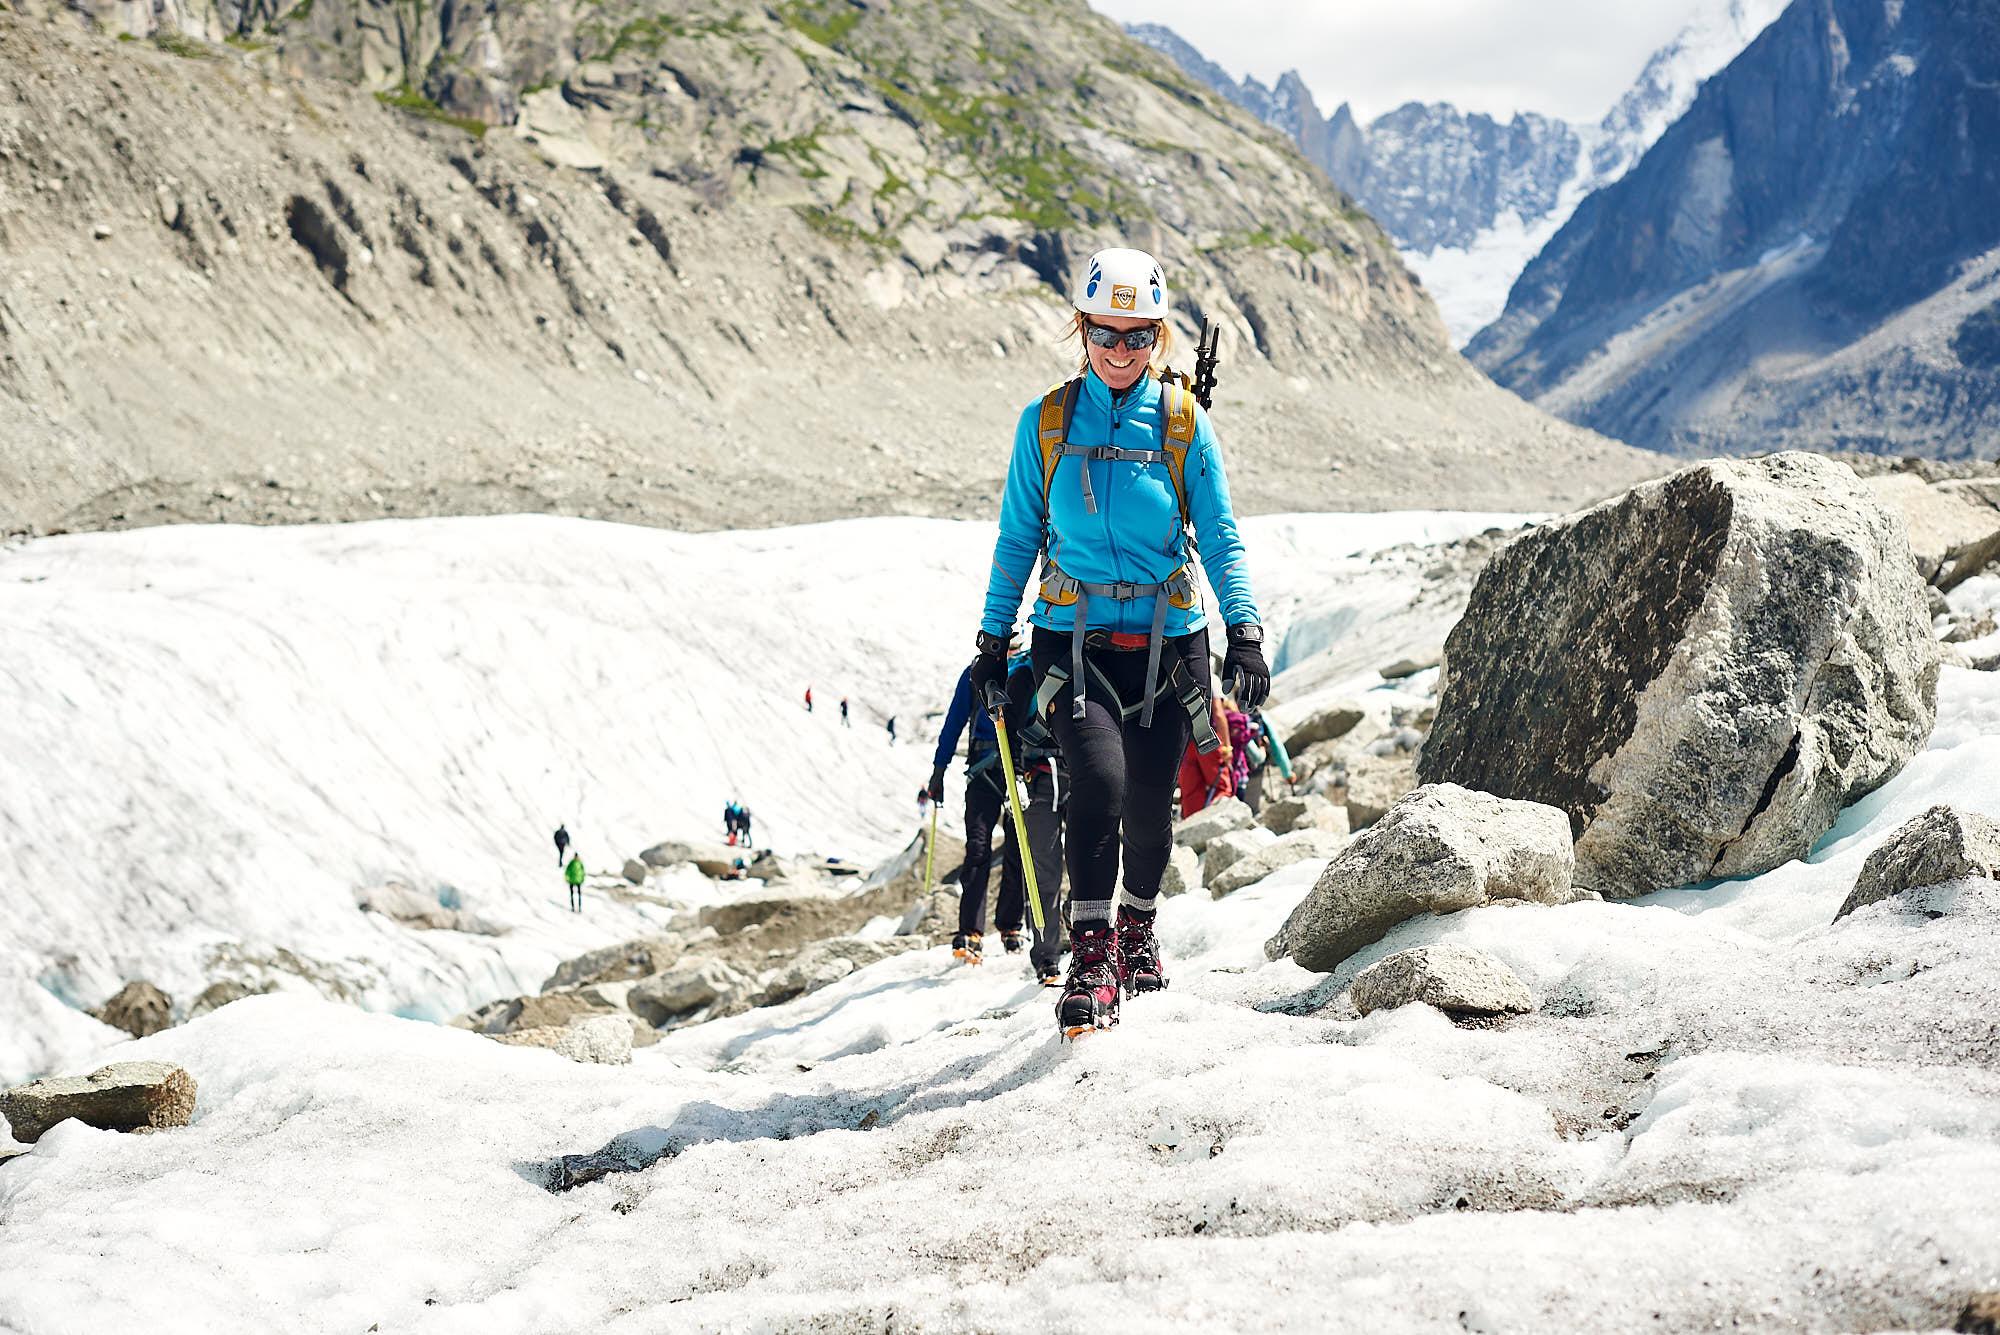 Alpinist walking on the Mer de Glace glacier near Chamonix